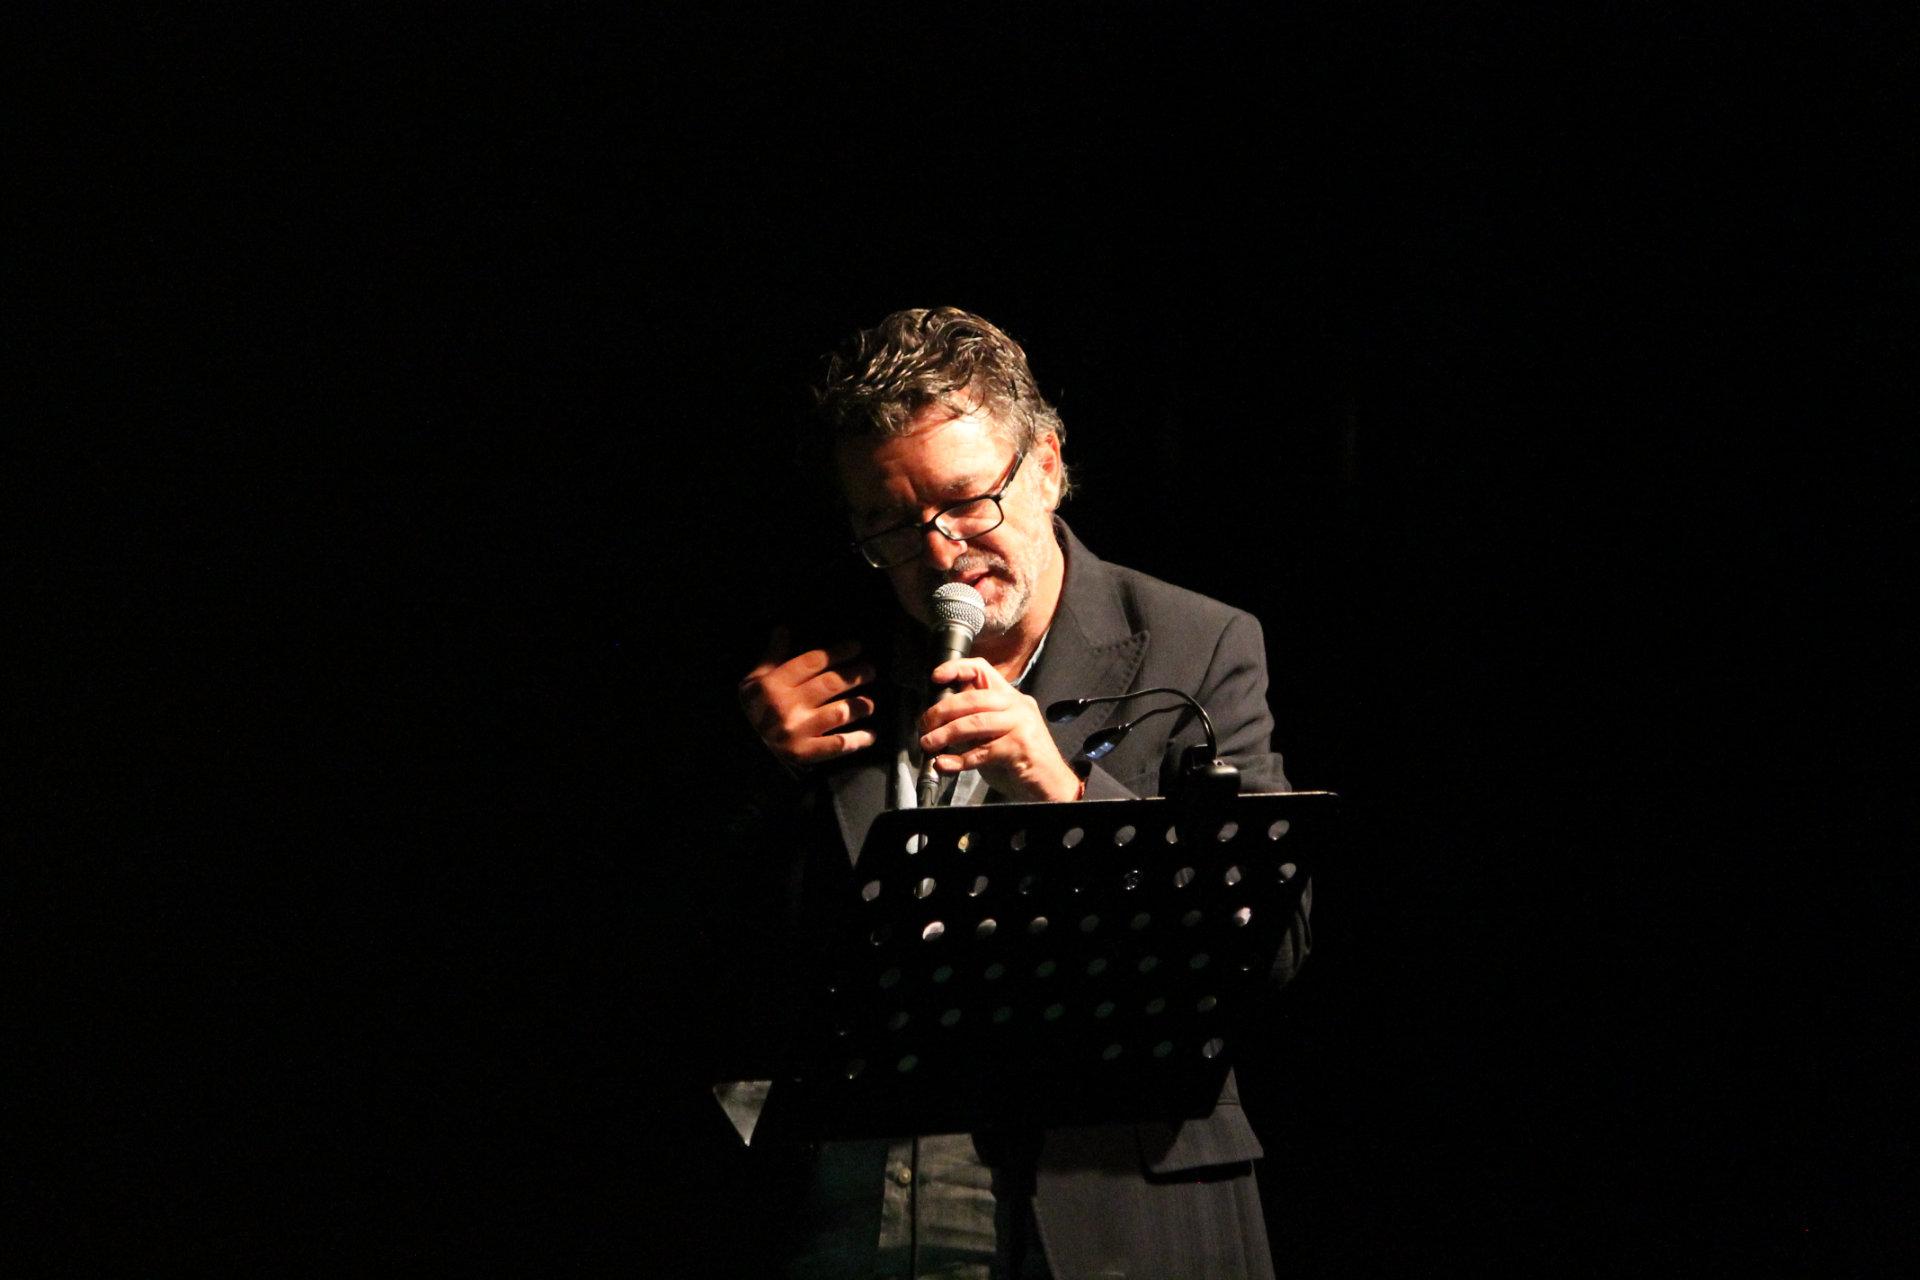 Fabio Palombo